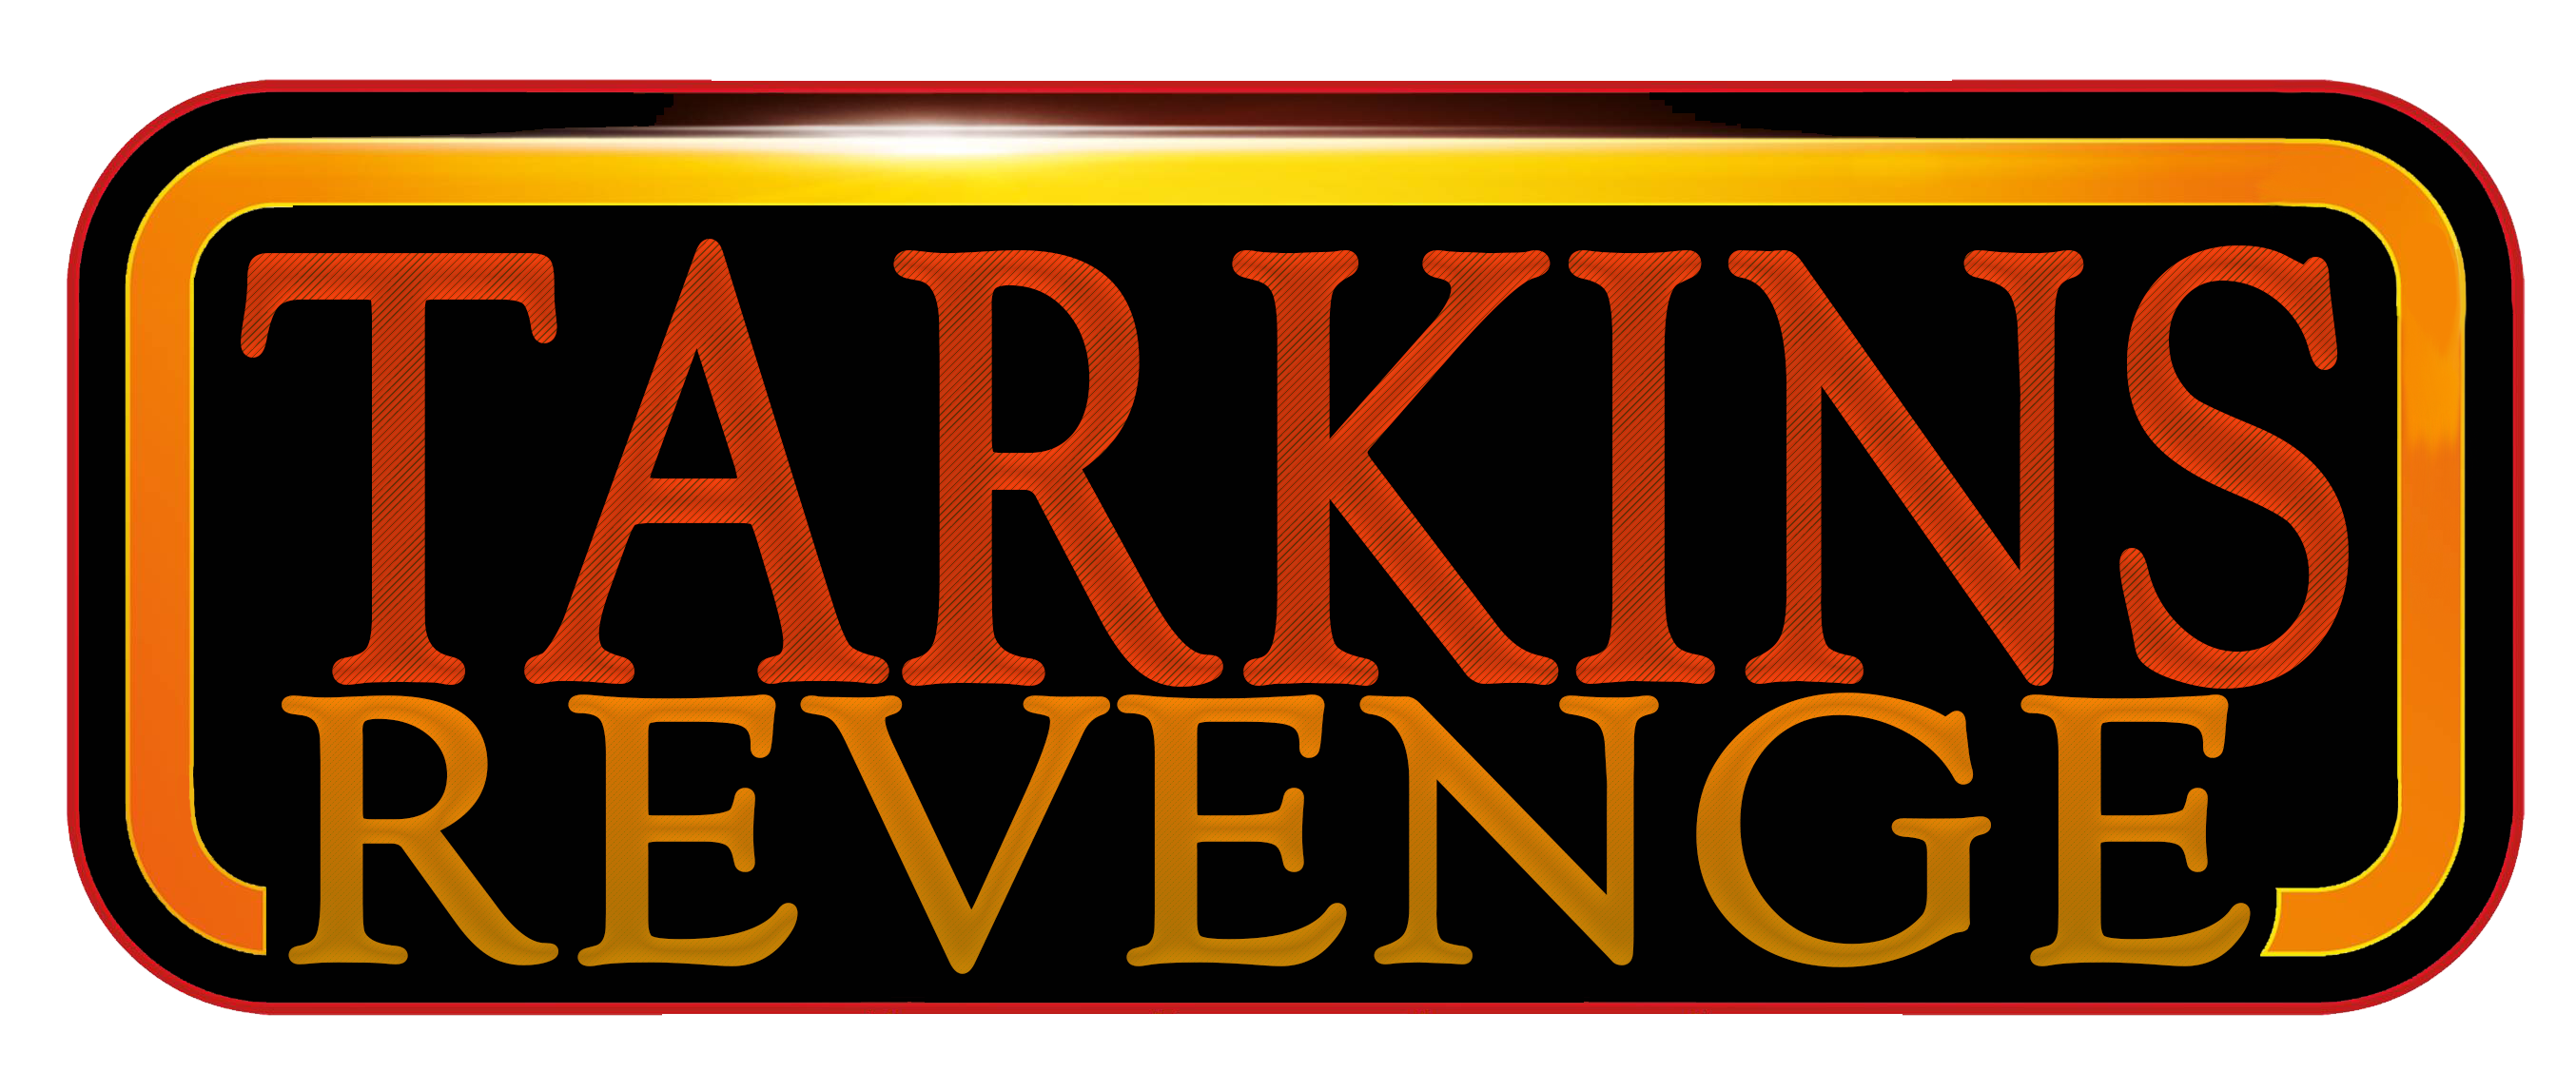 Tarkins Revenge